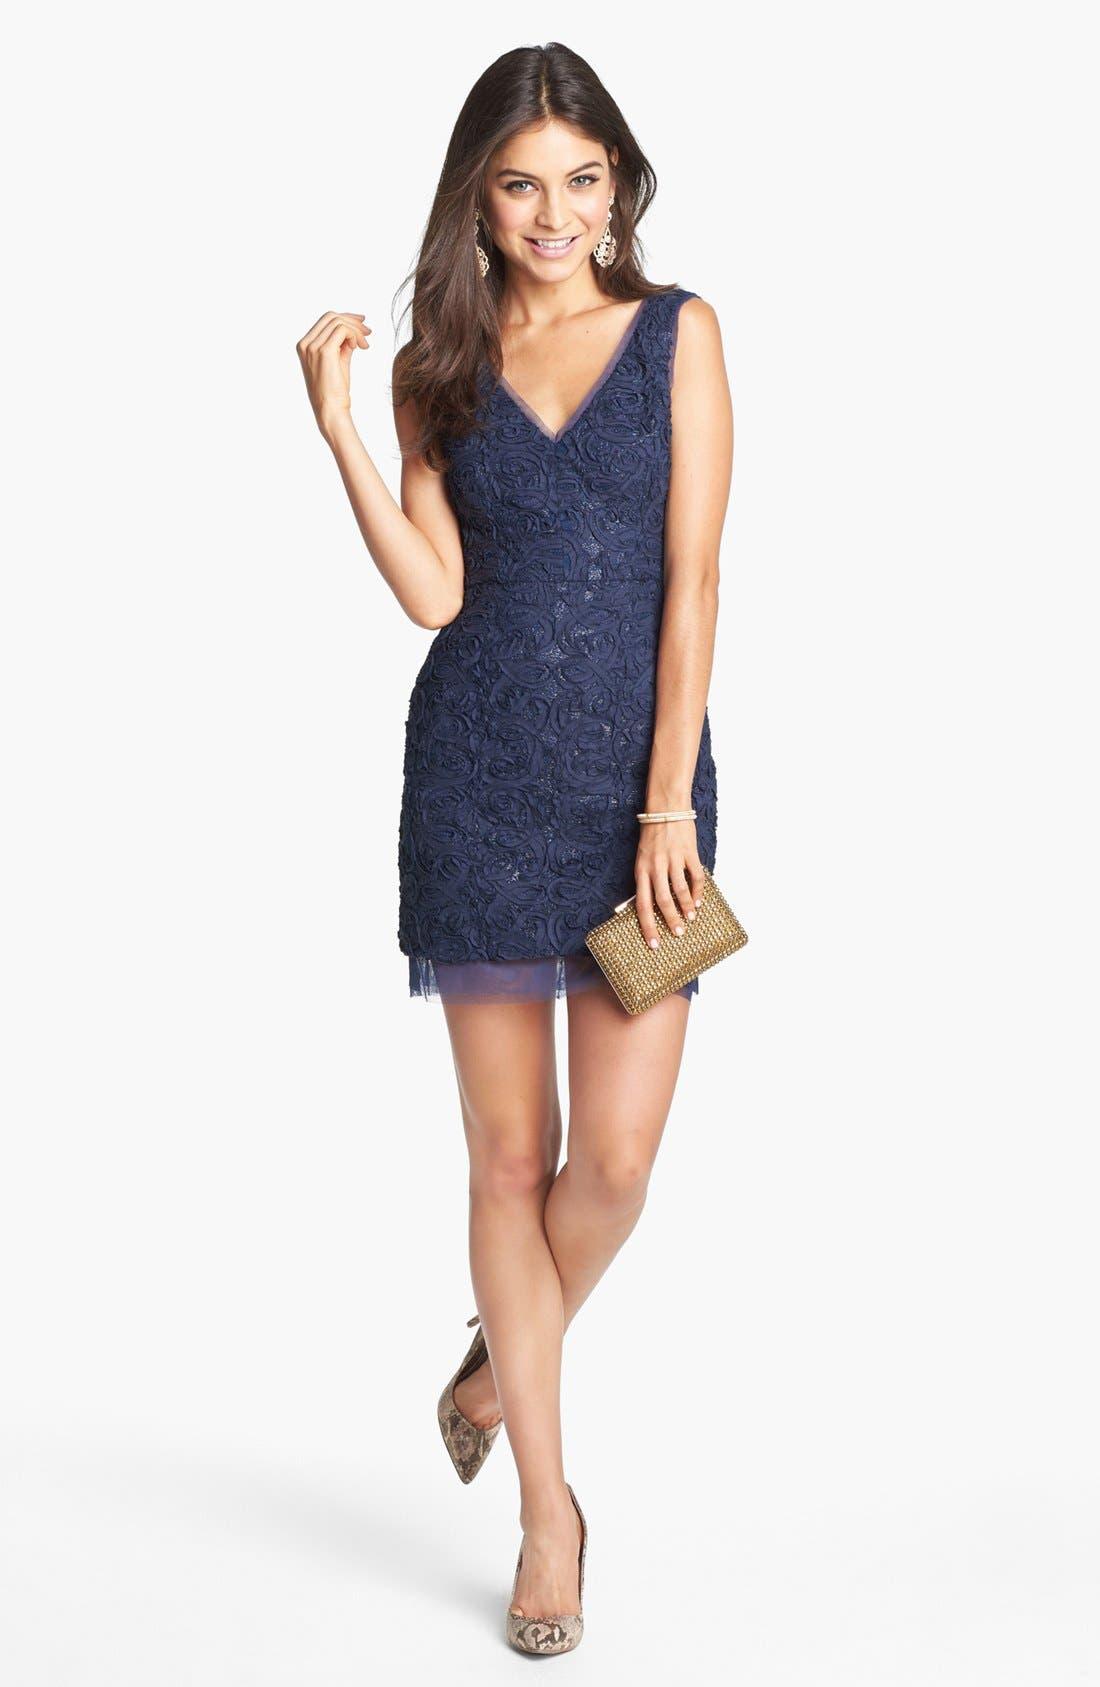 Main Image - BCBGMAXAZRIA 'Marissa' Rosette Embellished Sheath Dress